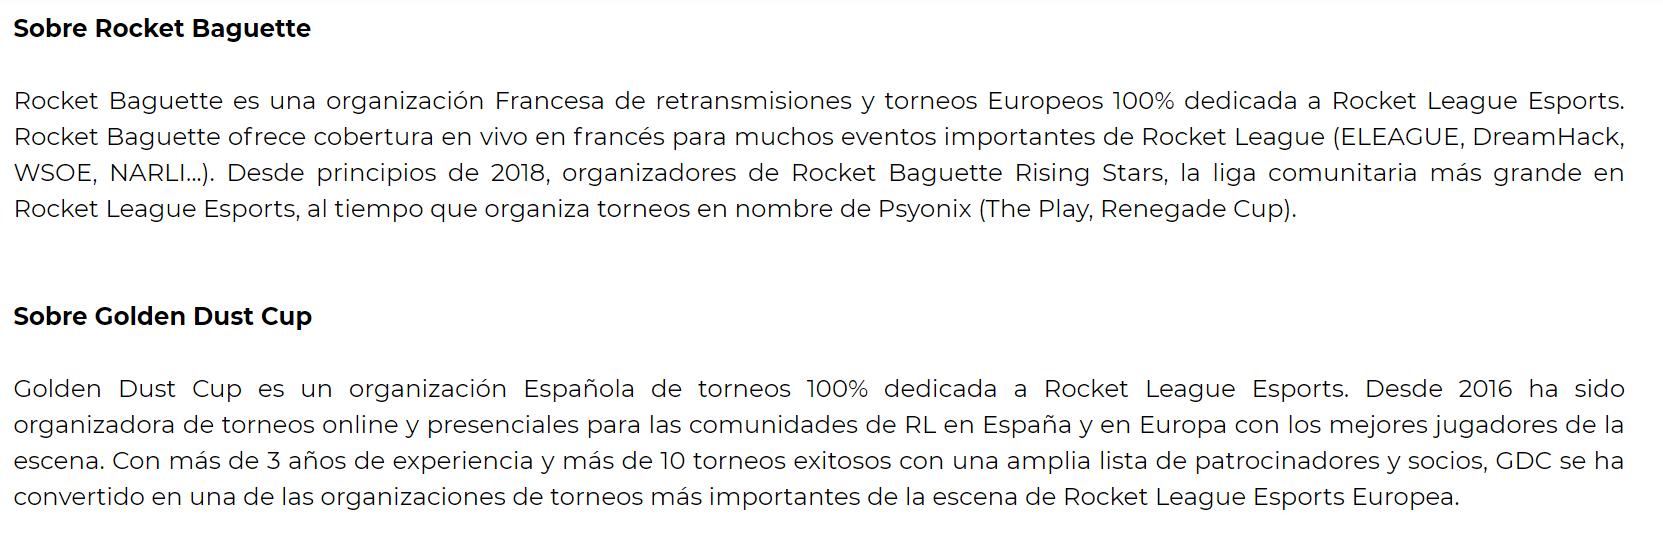 Información detallada sobre Rocket Baguette y Golden Dust Cup. Más detalles en https://goldendustcup.info/asociacion-entre-rocket-baguette-y-golden-dust-cup/